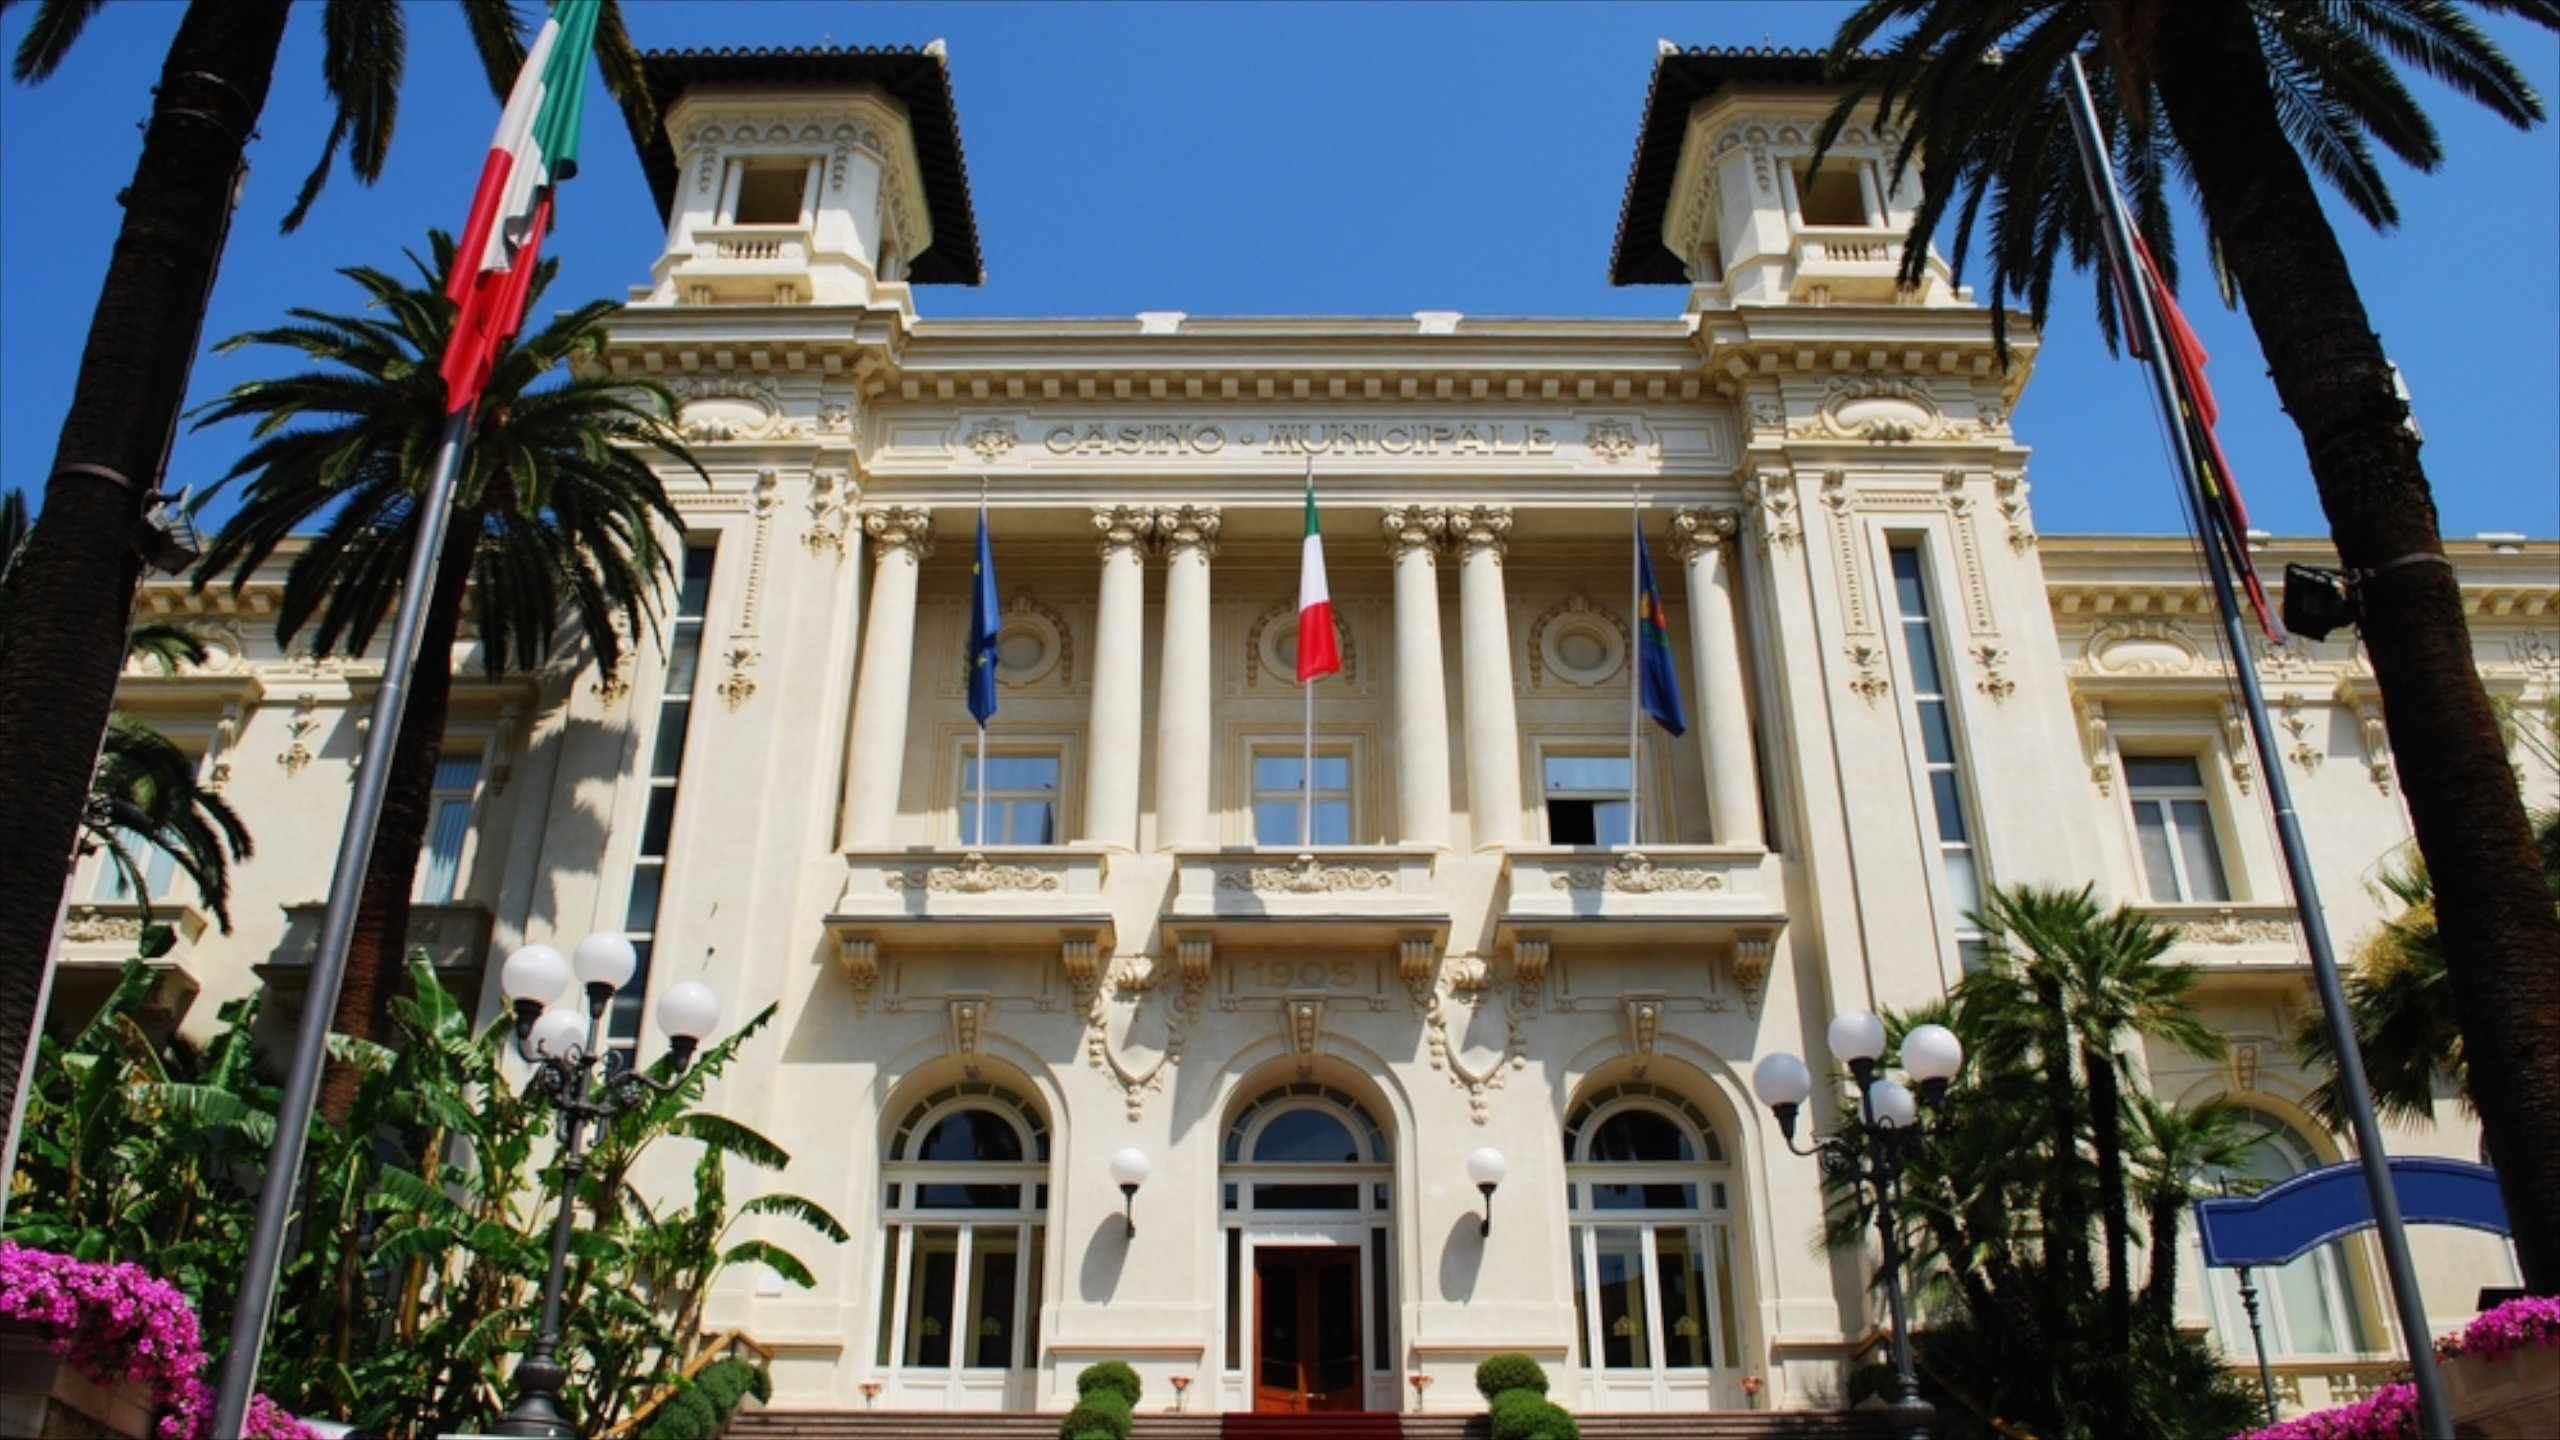 Casino Sanremo, Sanremo, Ligurië, Italië